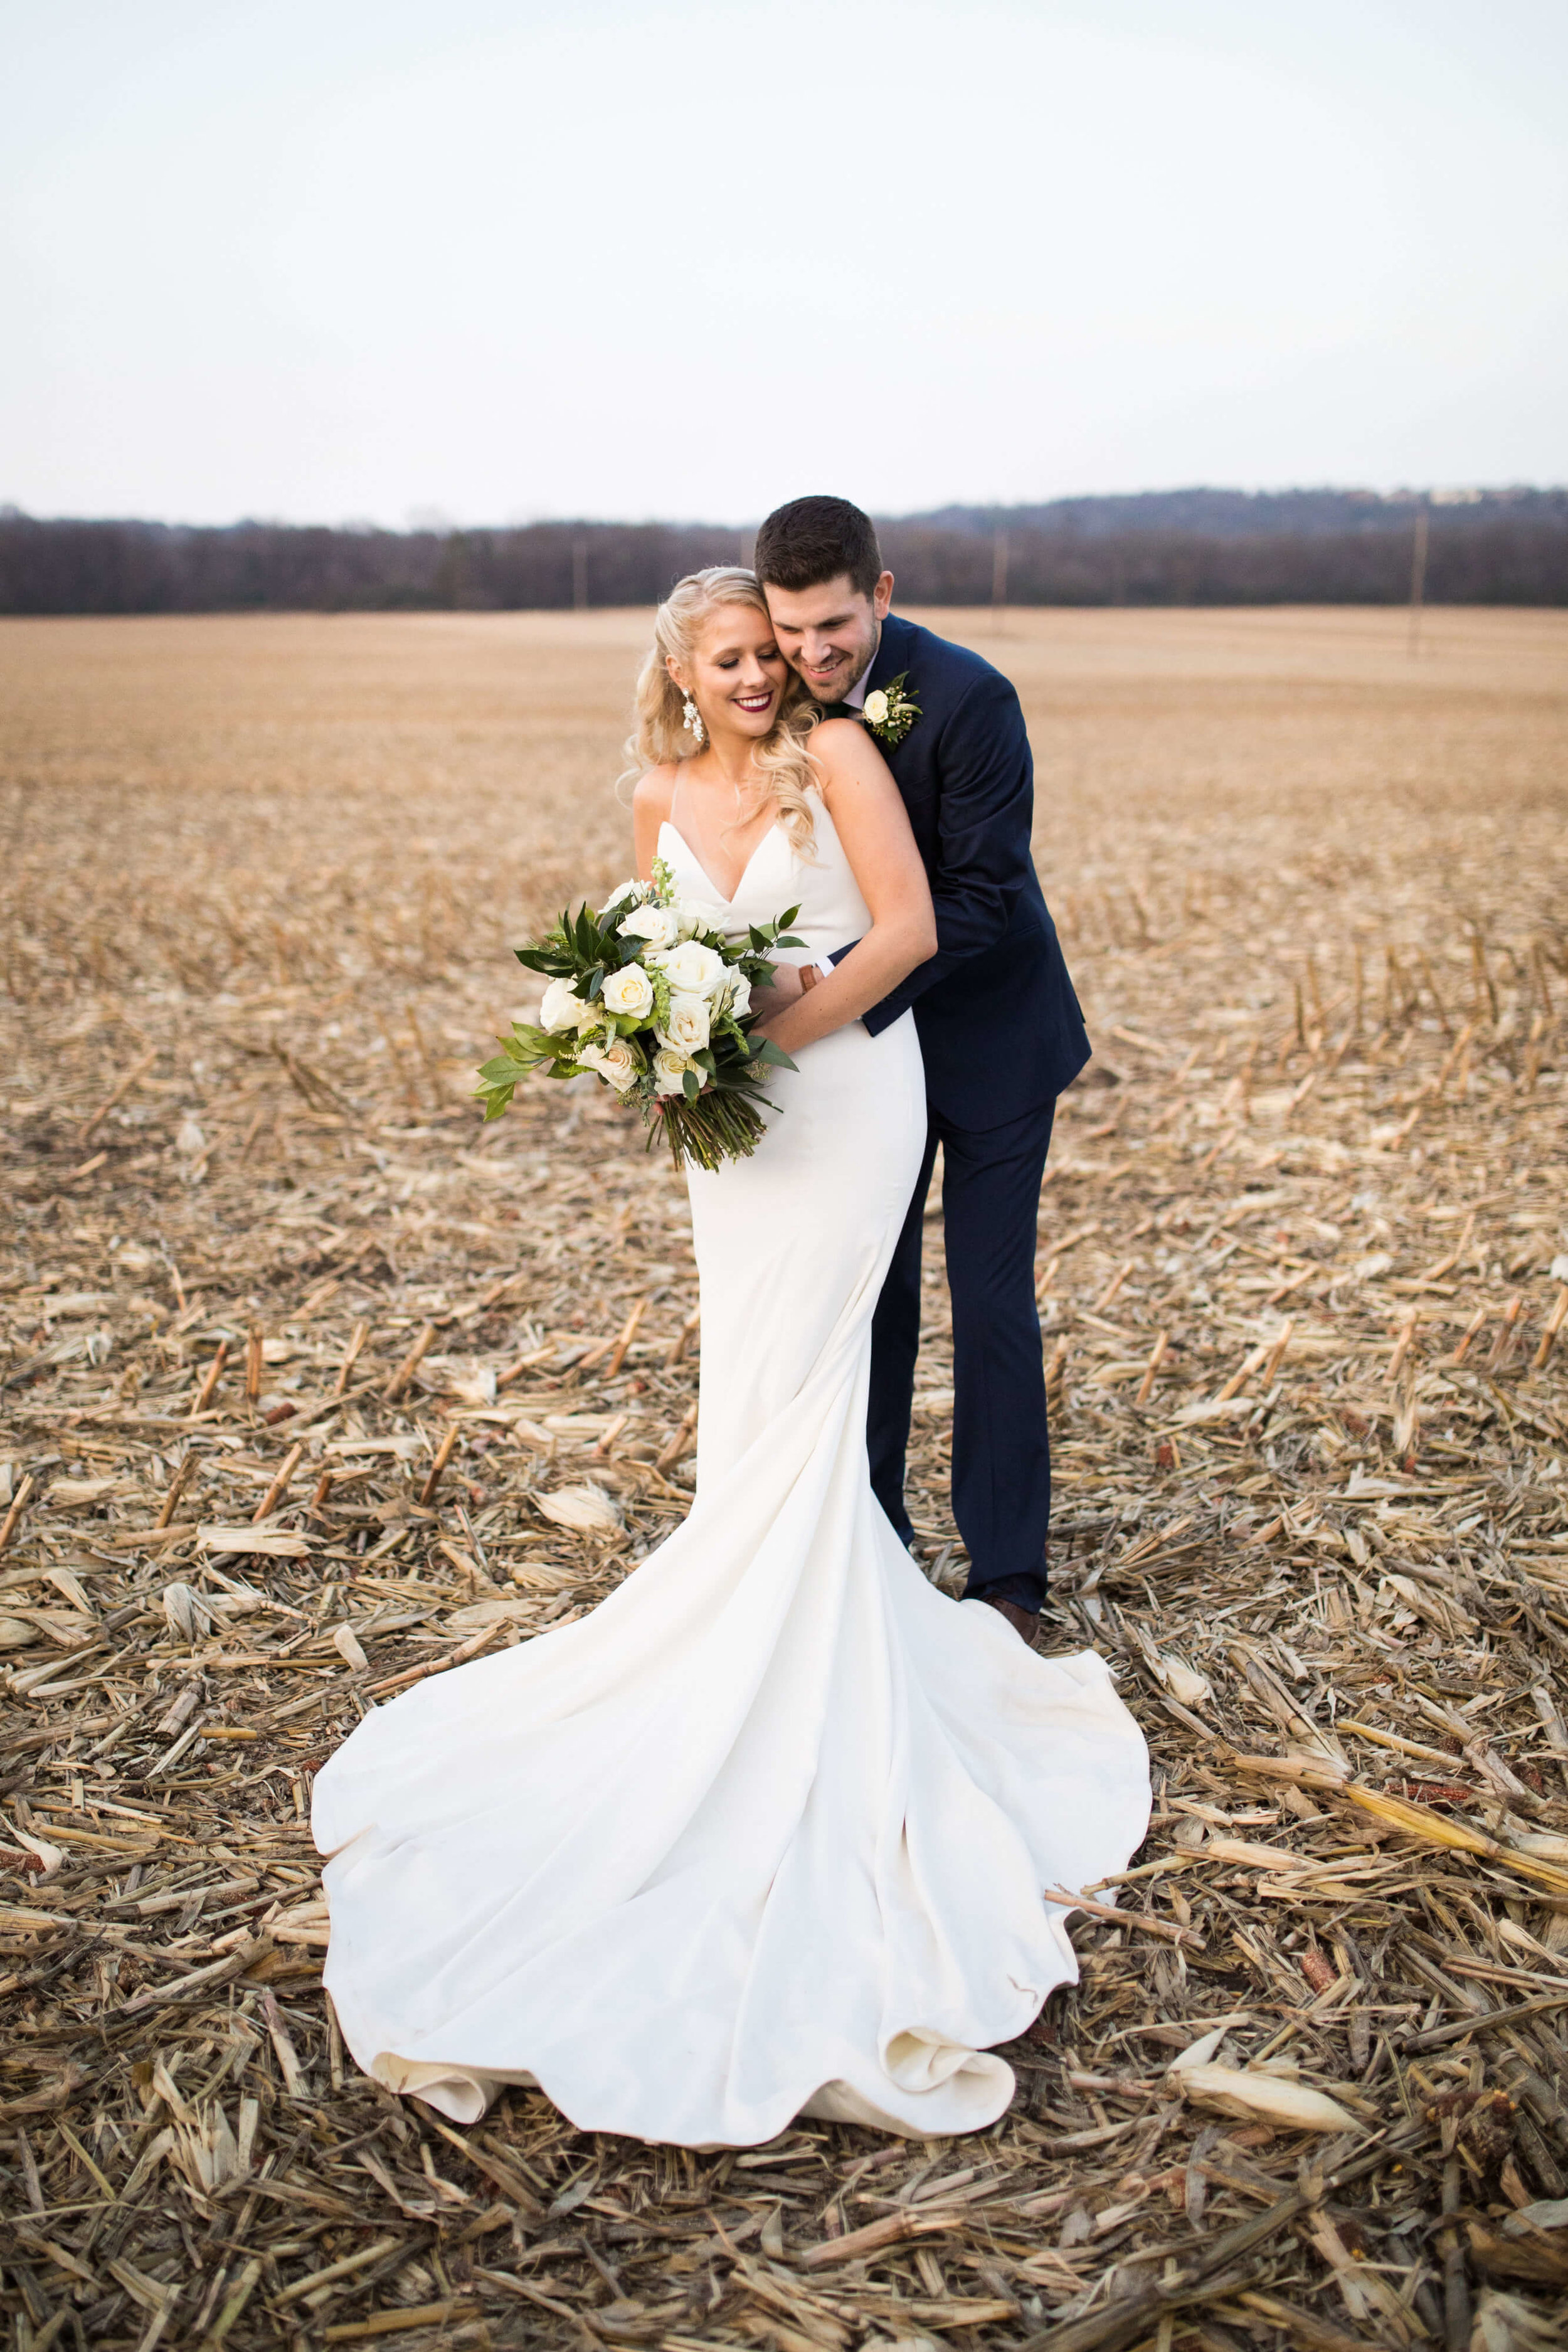 harvested field | long train | green and white bouquet | v neck dress | Minnesota wedding photographer Studio KH wedding dress details | wedding blog | Sixpence Events 70 Ways to Photograph Your Wedding Dress.jpg